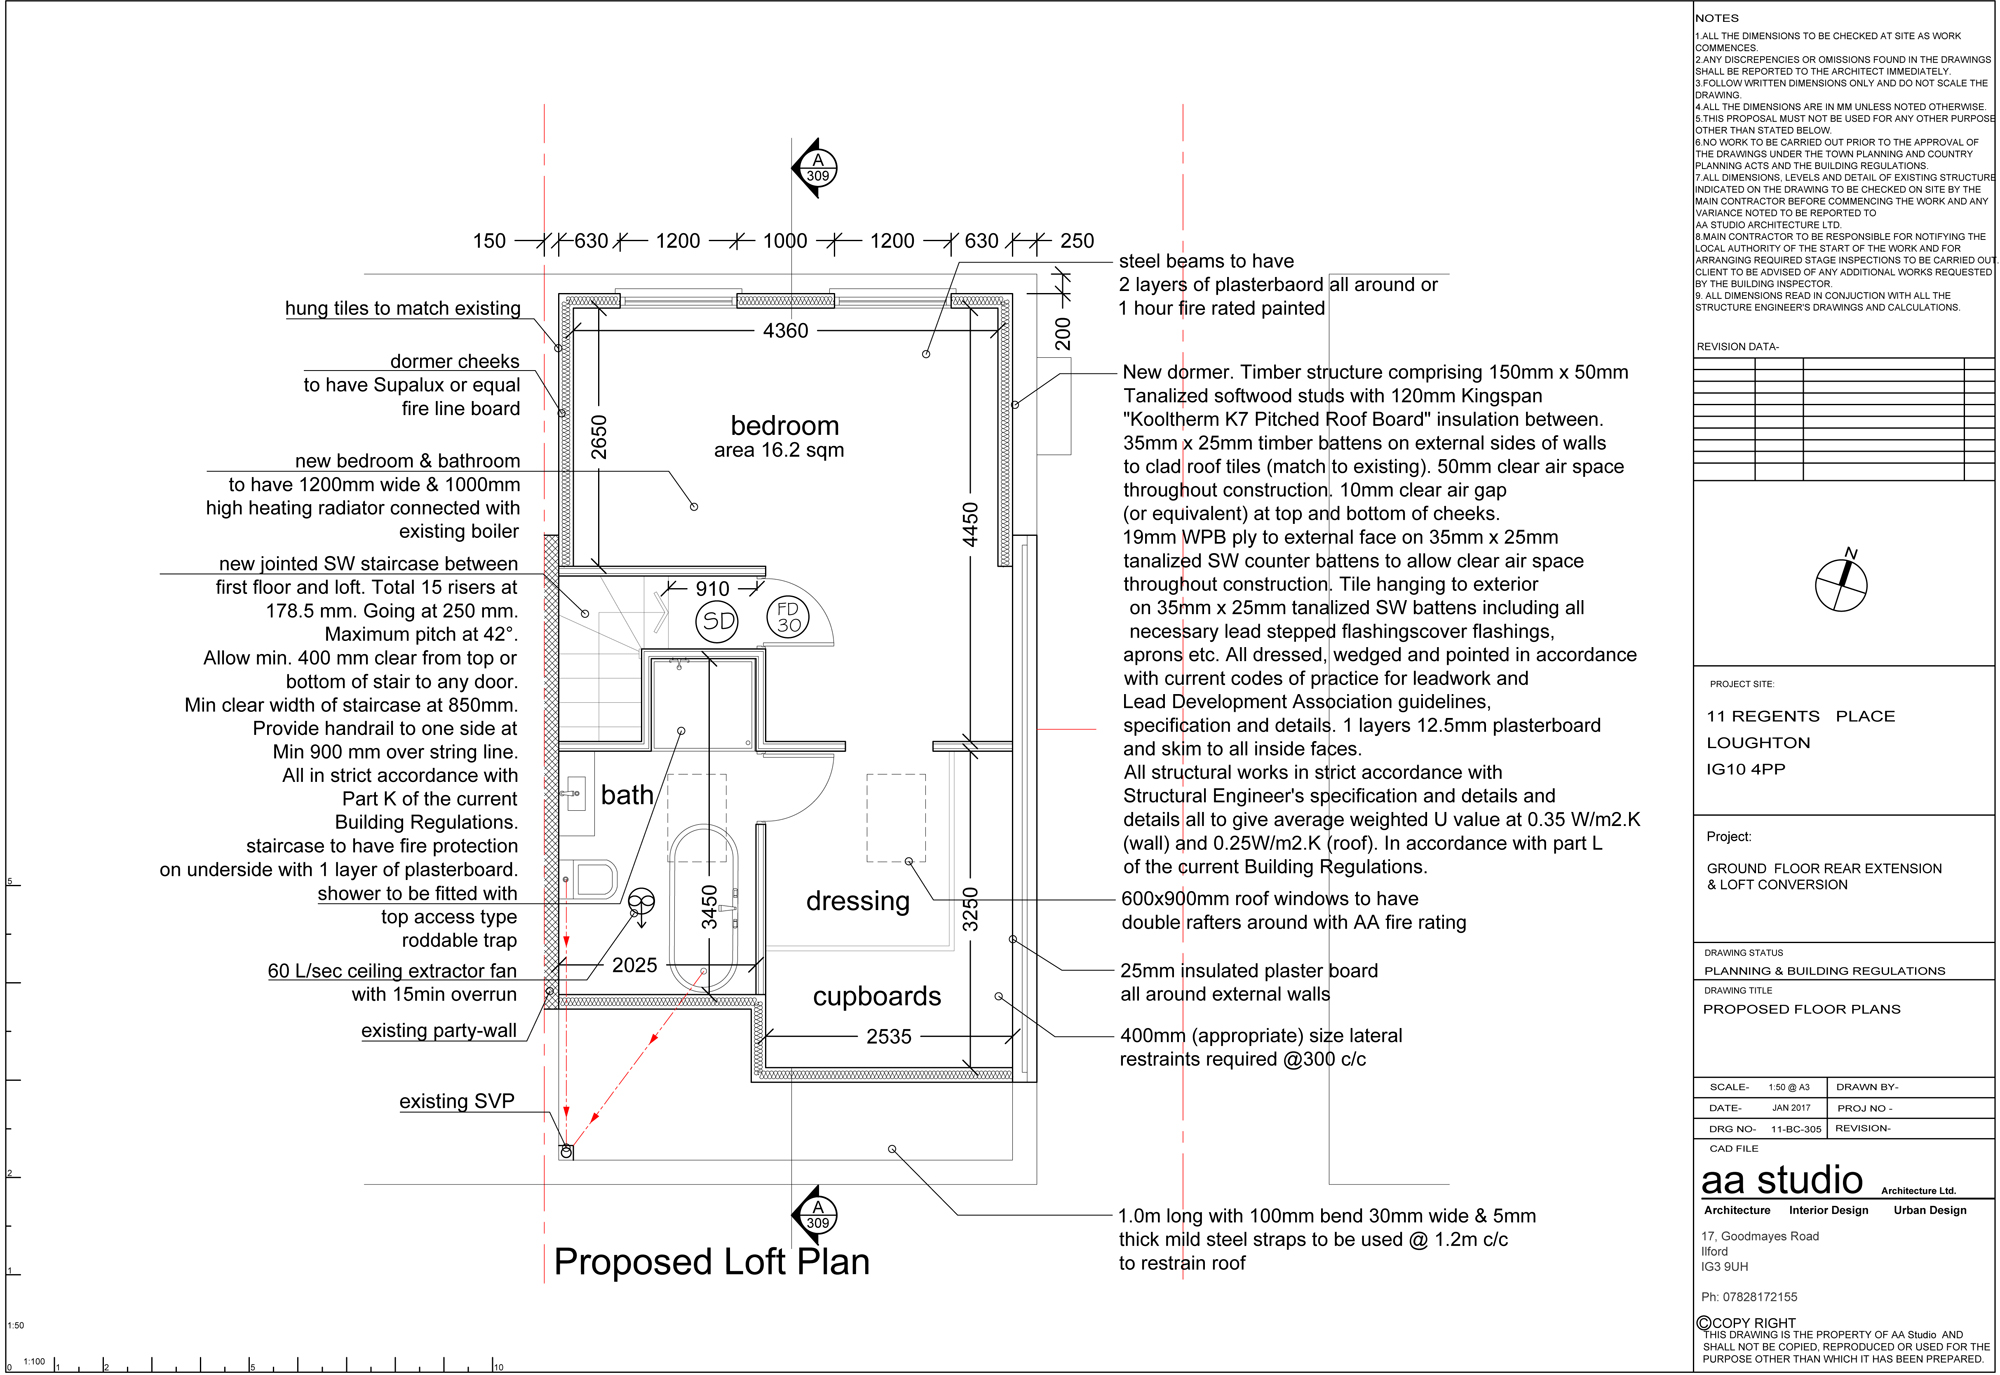 House Extension Loughton